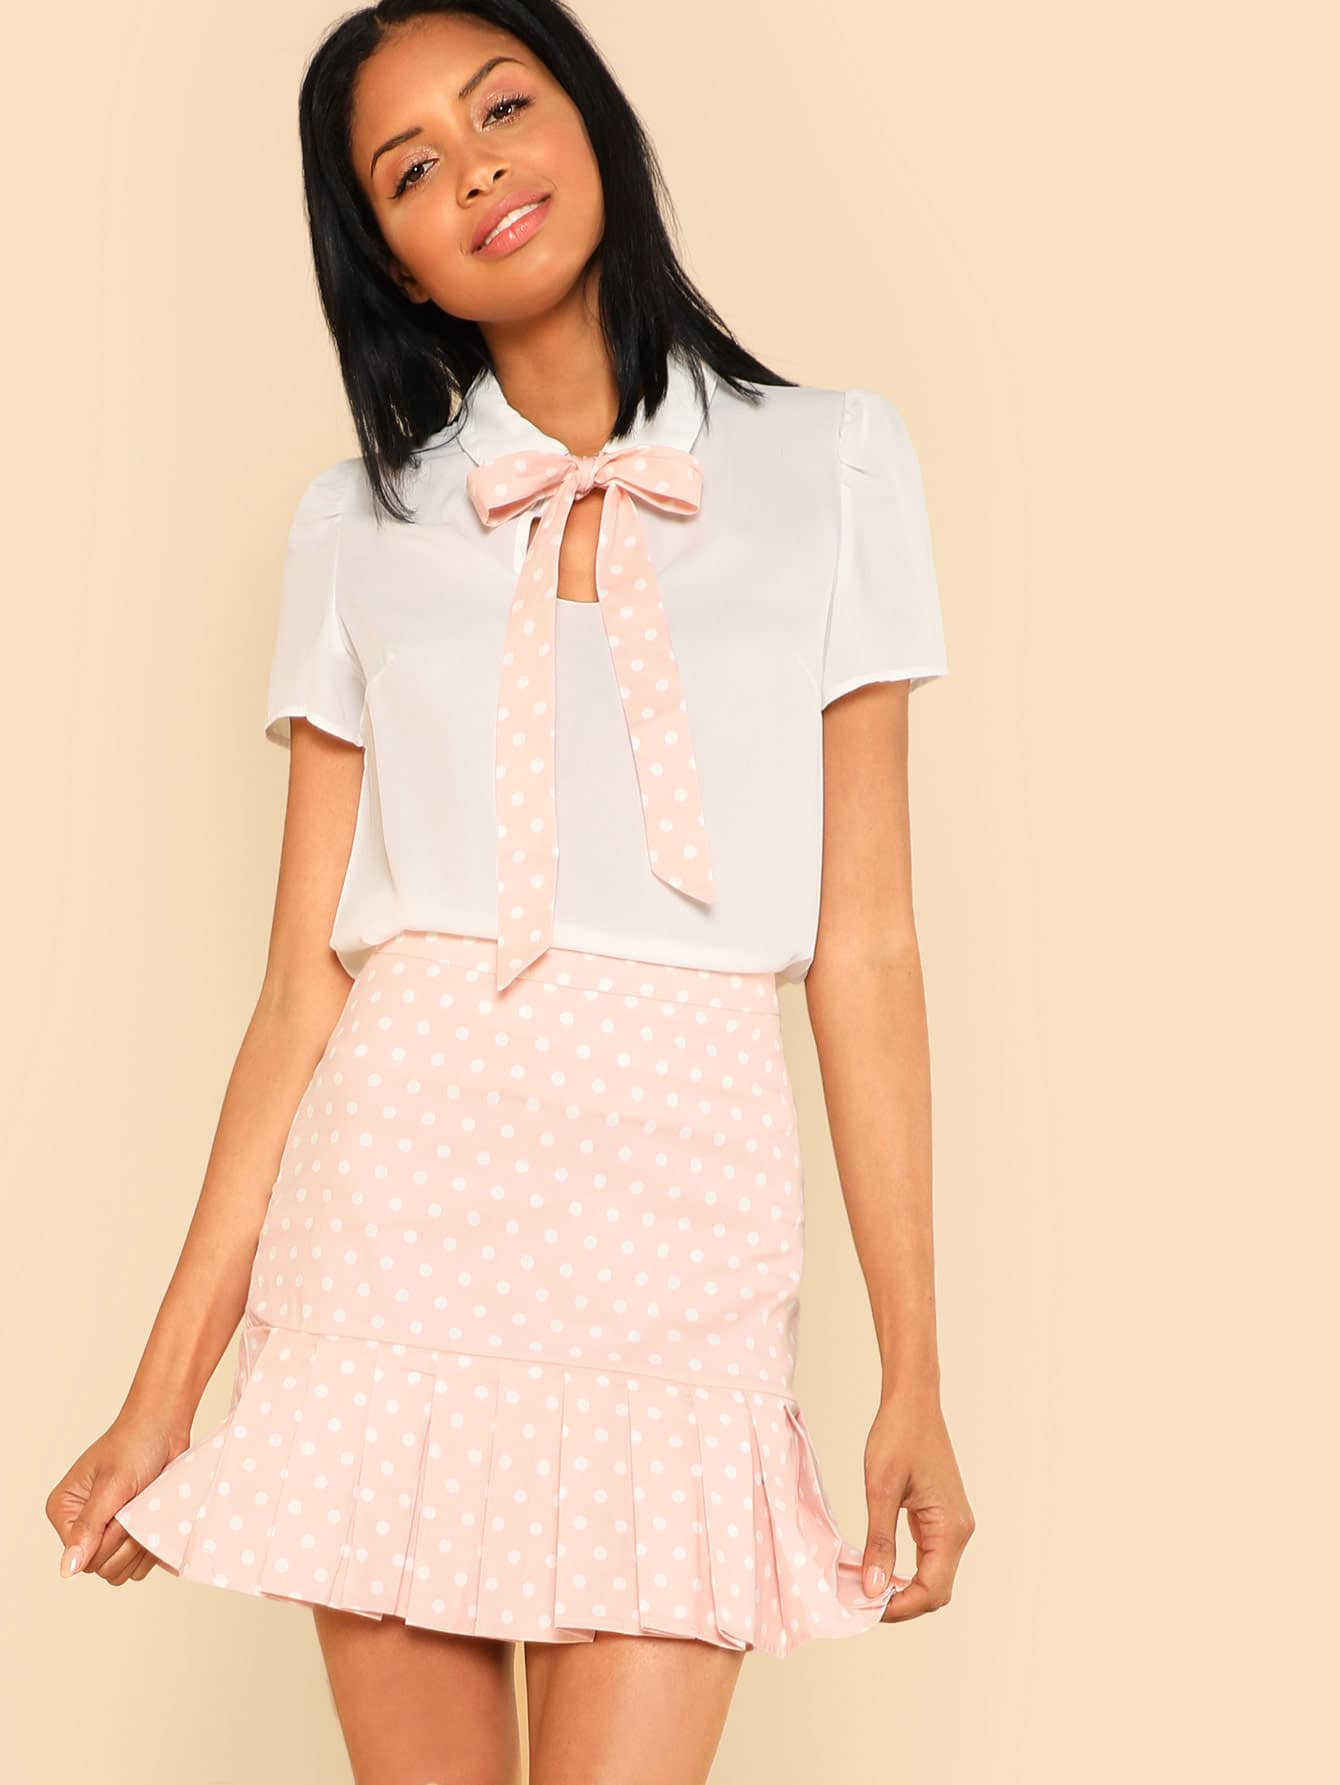 Tie Neck Top & Ruffle Polka Dot Skirt Co-Ord